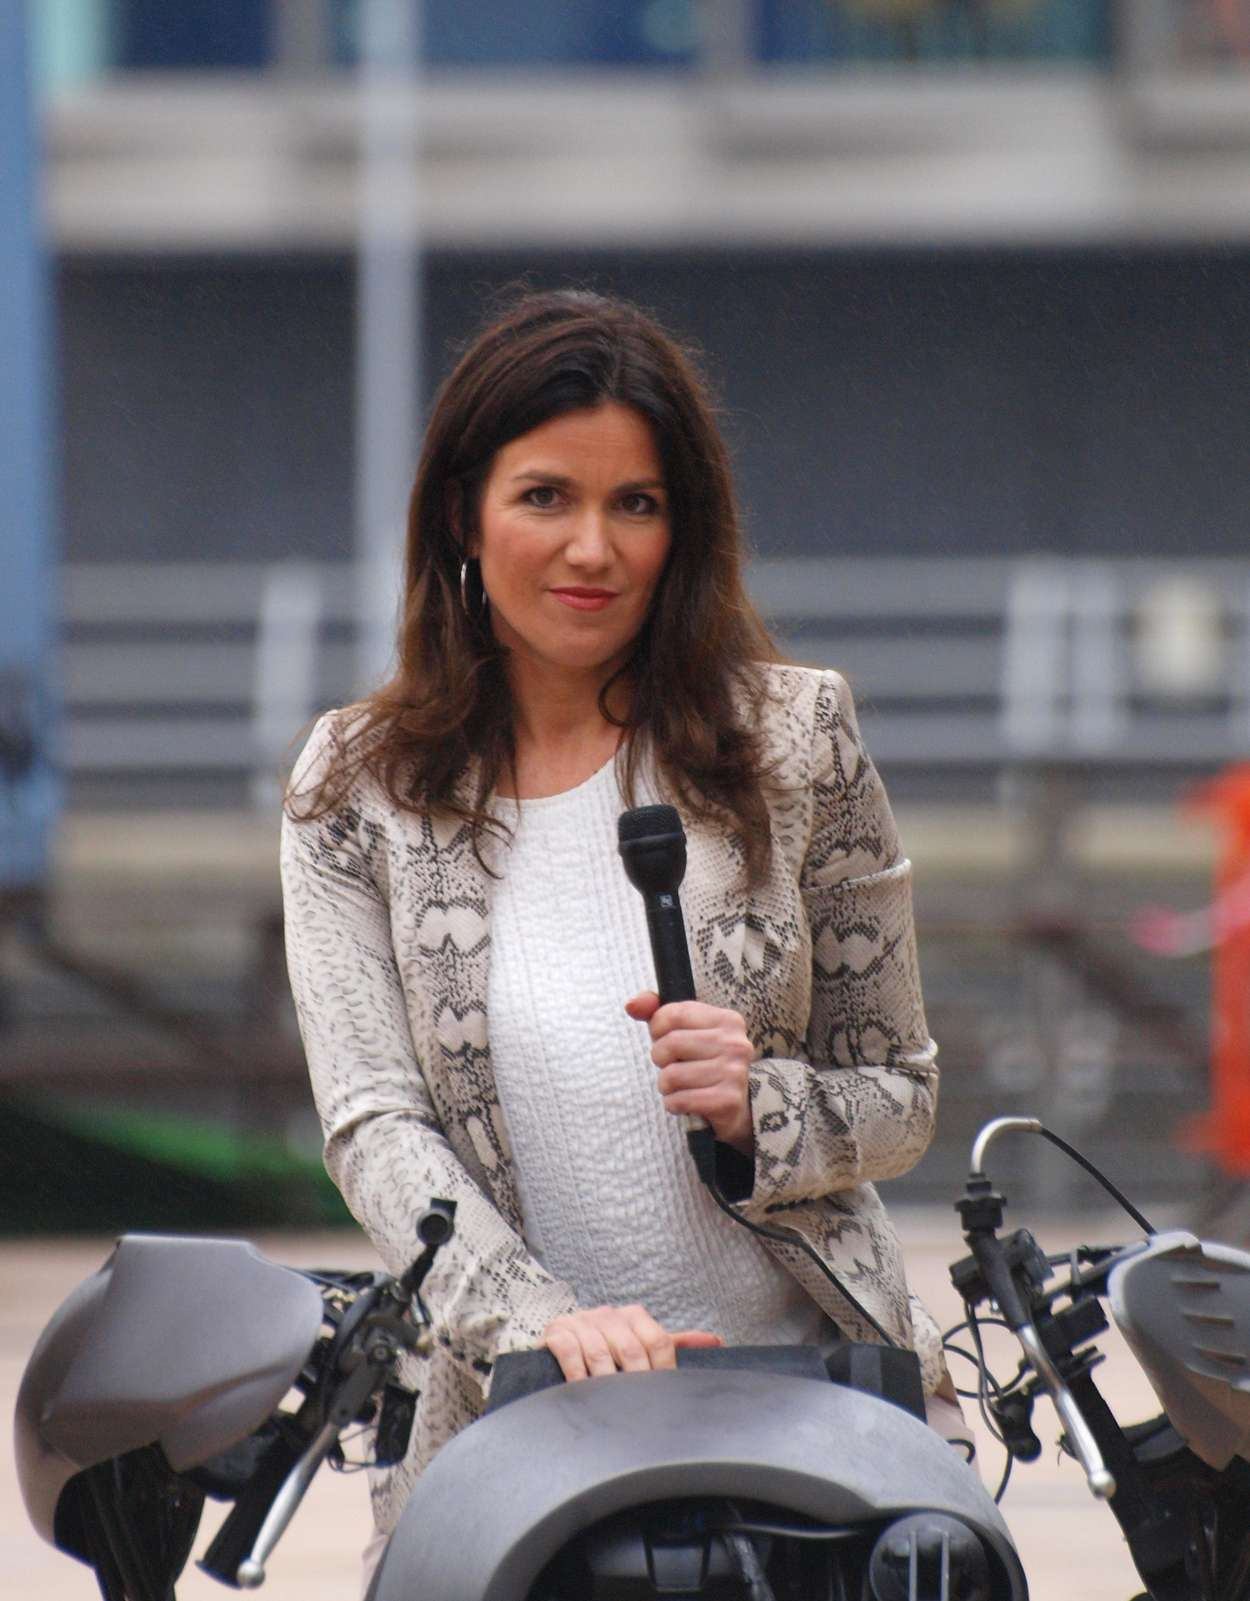 Susanna Reid Outside BBC Studios Salford on Bat-motorcycle